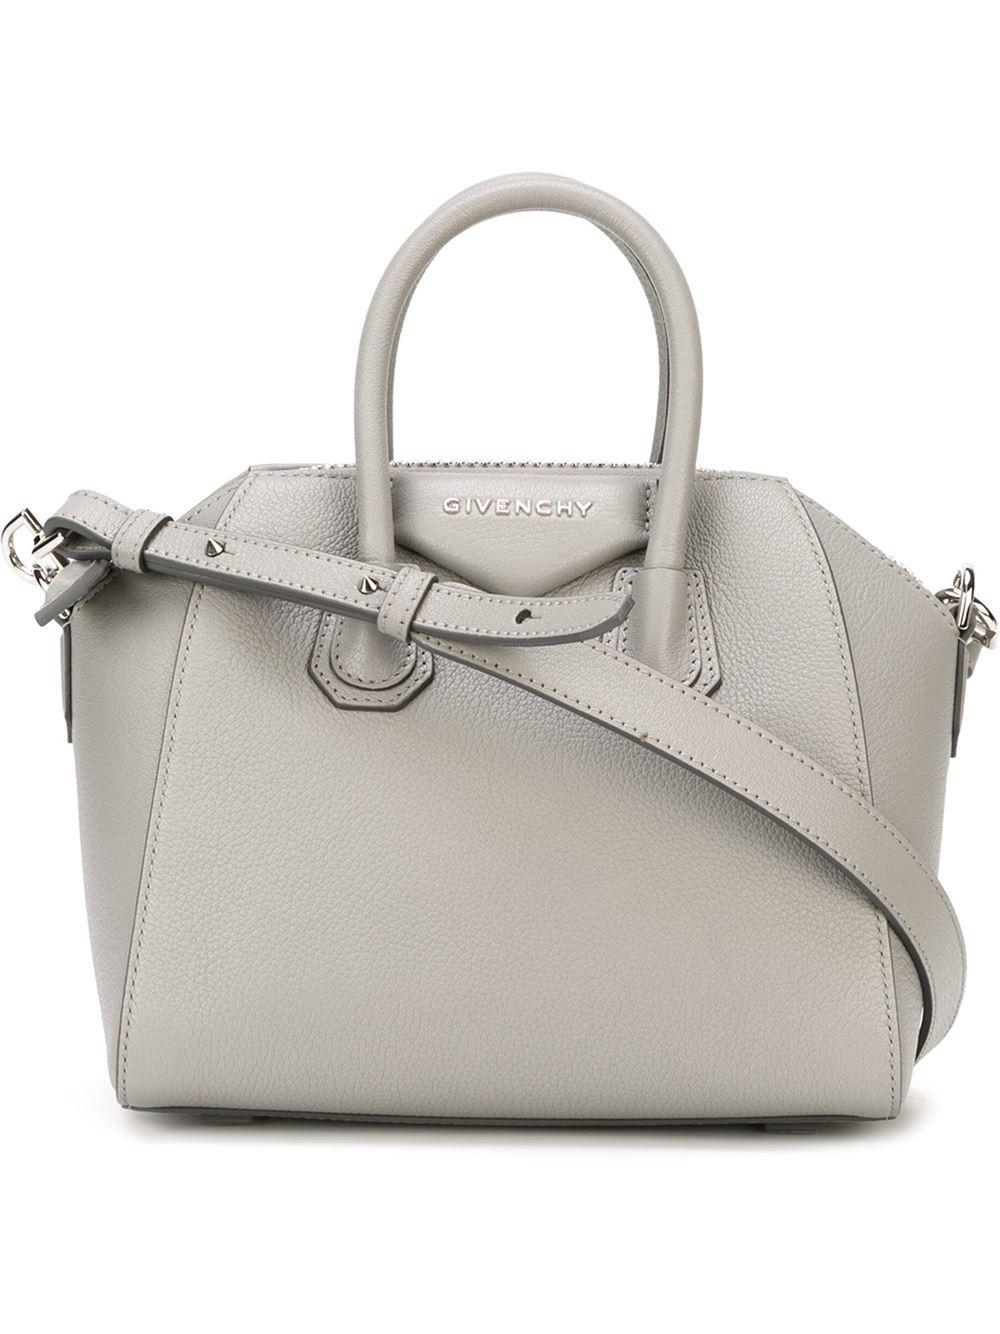 ... Ultimate Bag Guide The Givenchy Antigona Bag - PurseBlog new product  27711  givenchy mini bag competitive price 703e2 d5c8c ... 27ec102438238